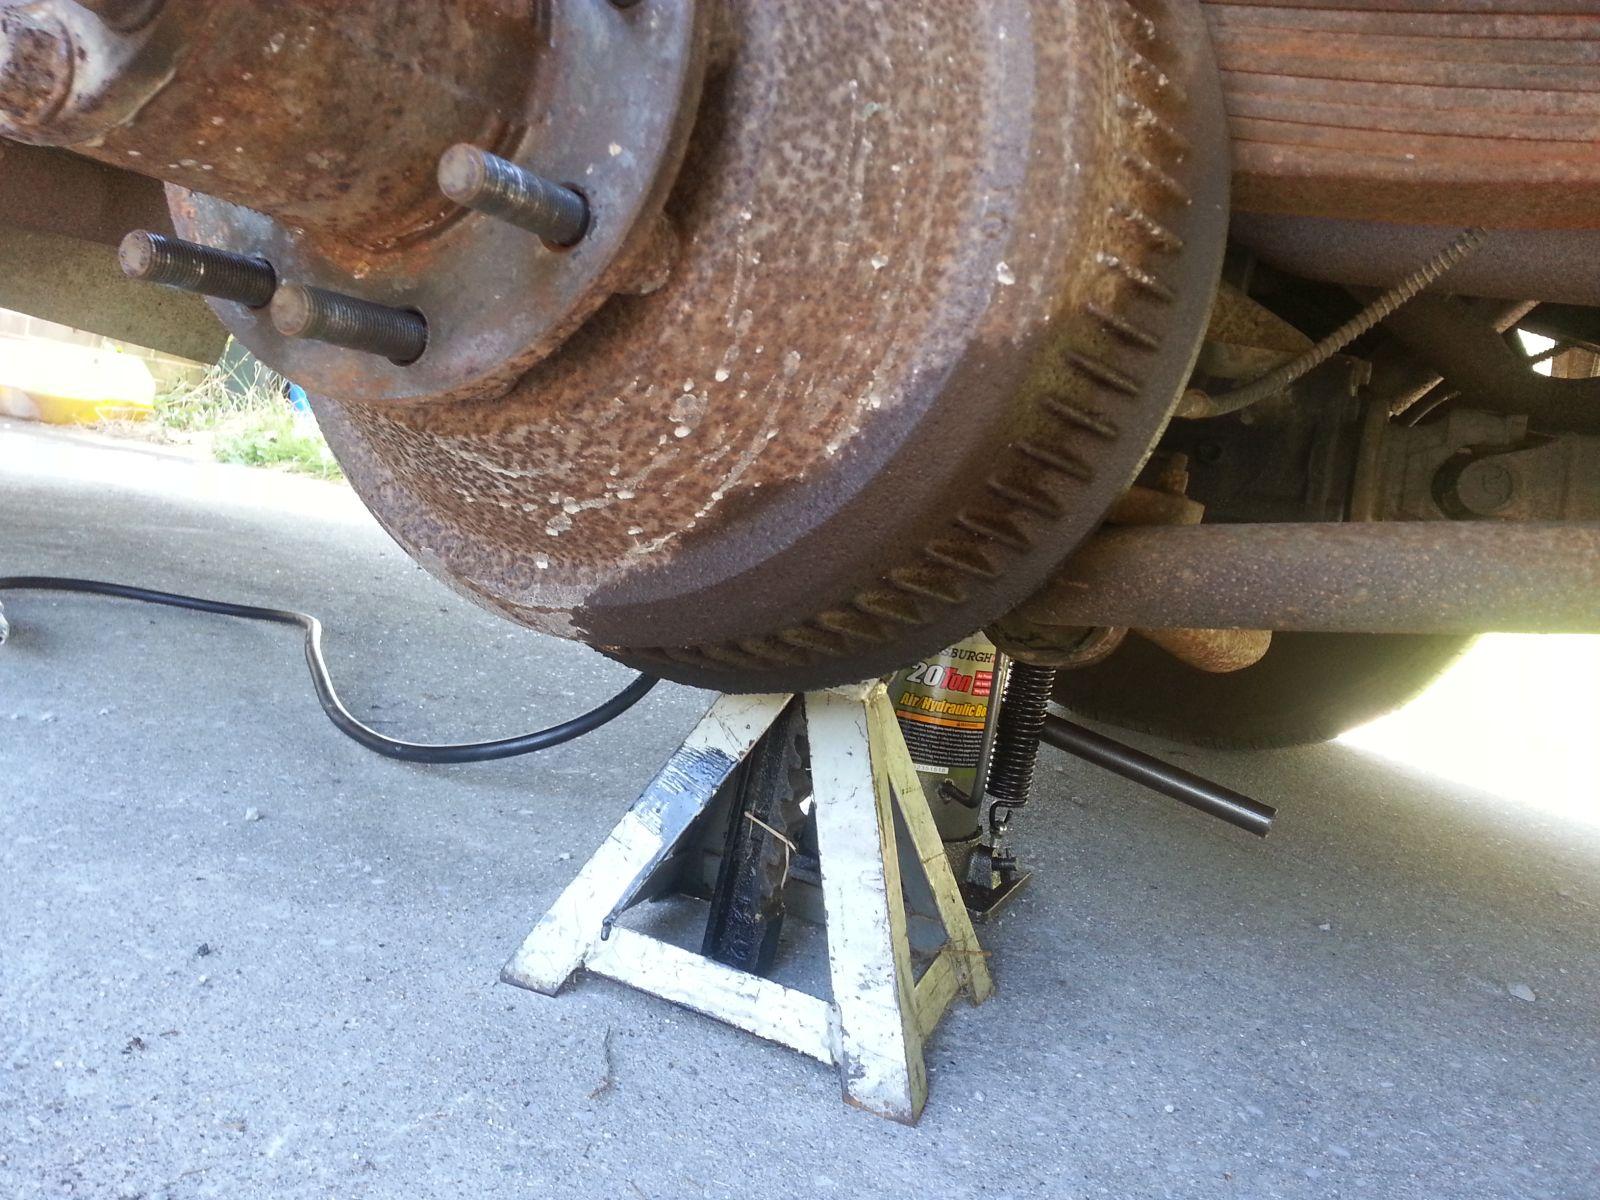 Click image for larger version  Name:peanut-left-rear-brake-drum.jpg Views:60 Size:323.8 KB ID:259896